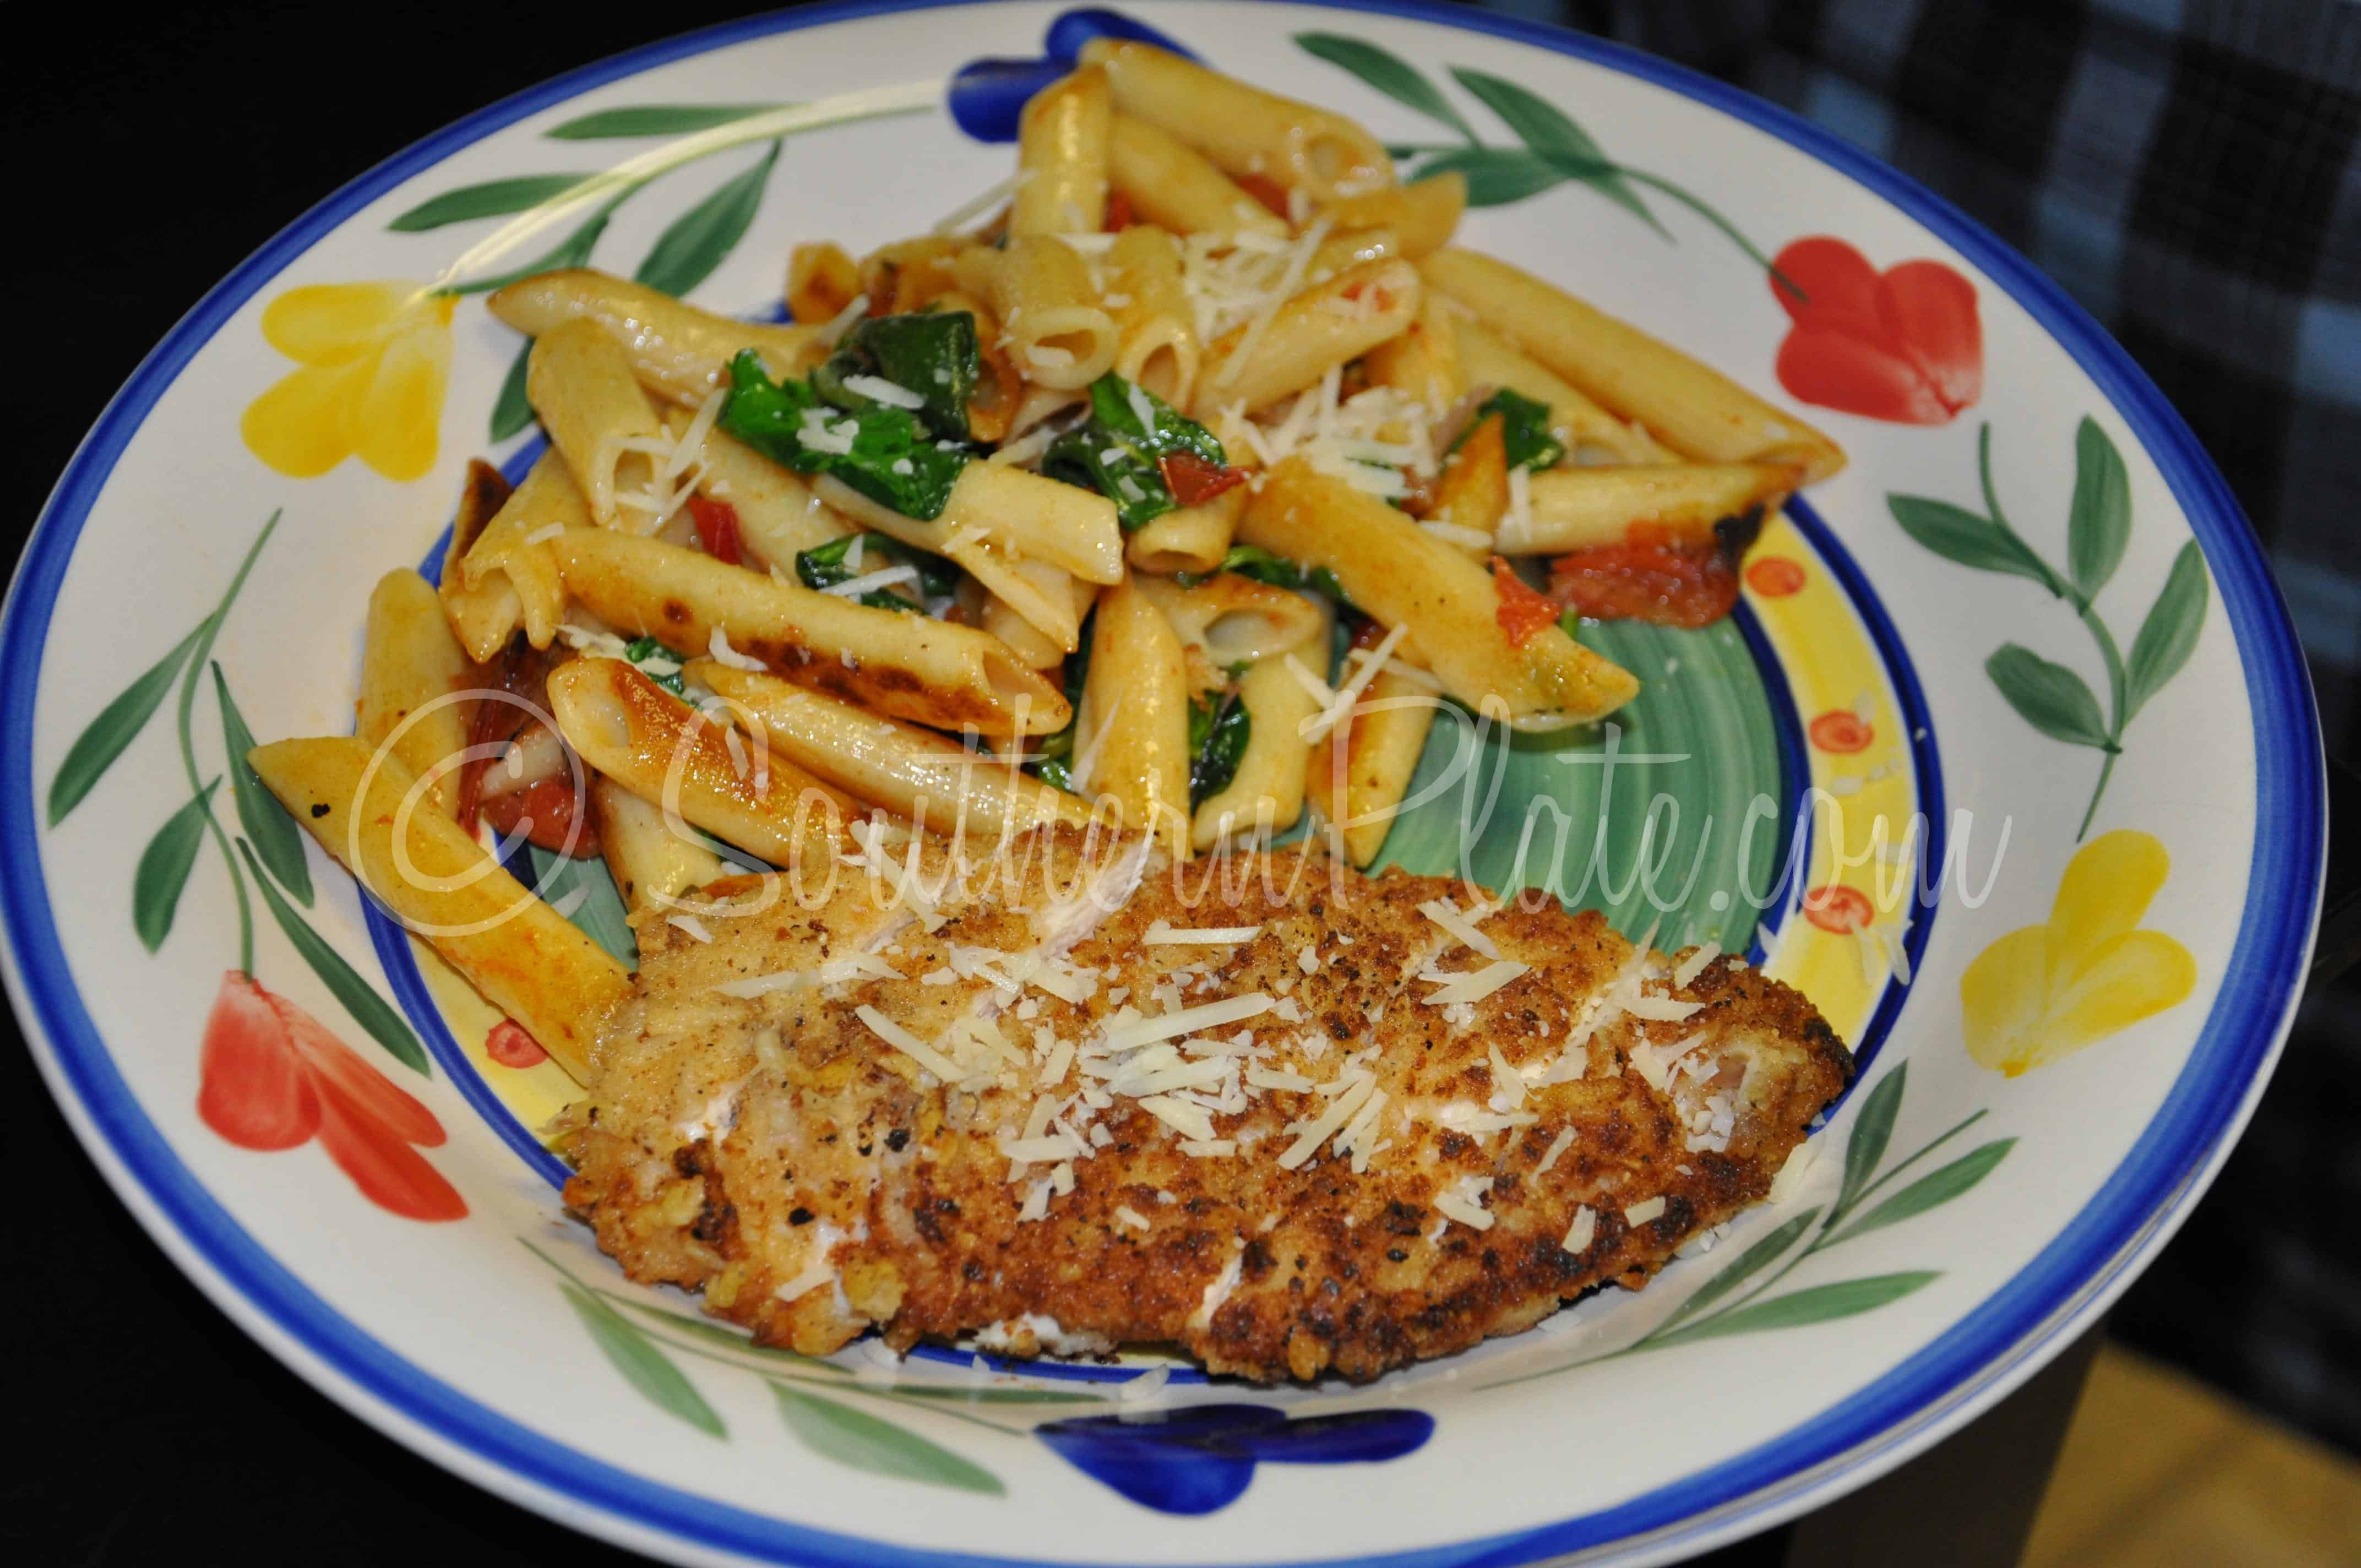 Parmesan Encrusted Chicken